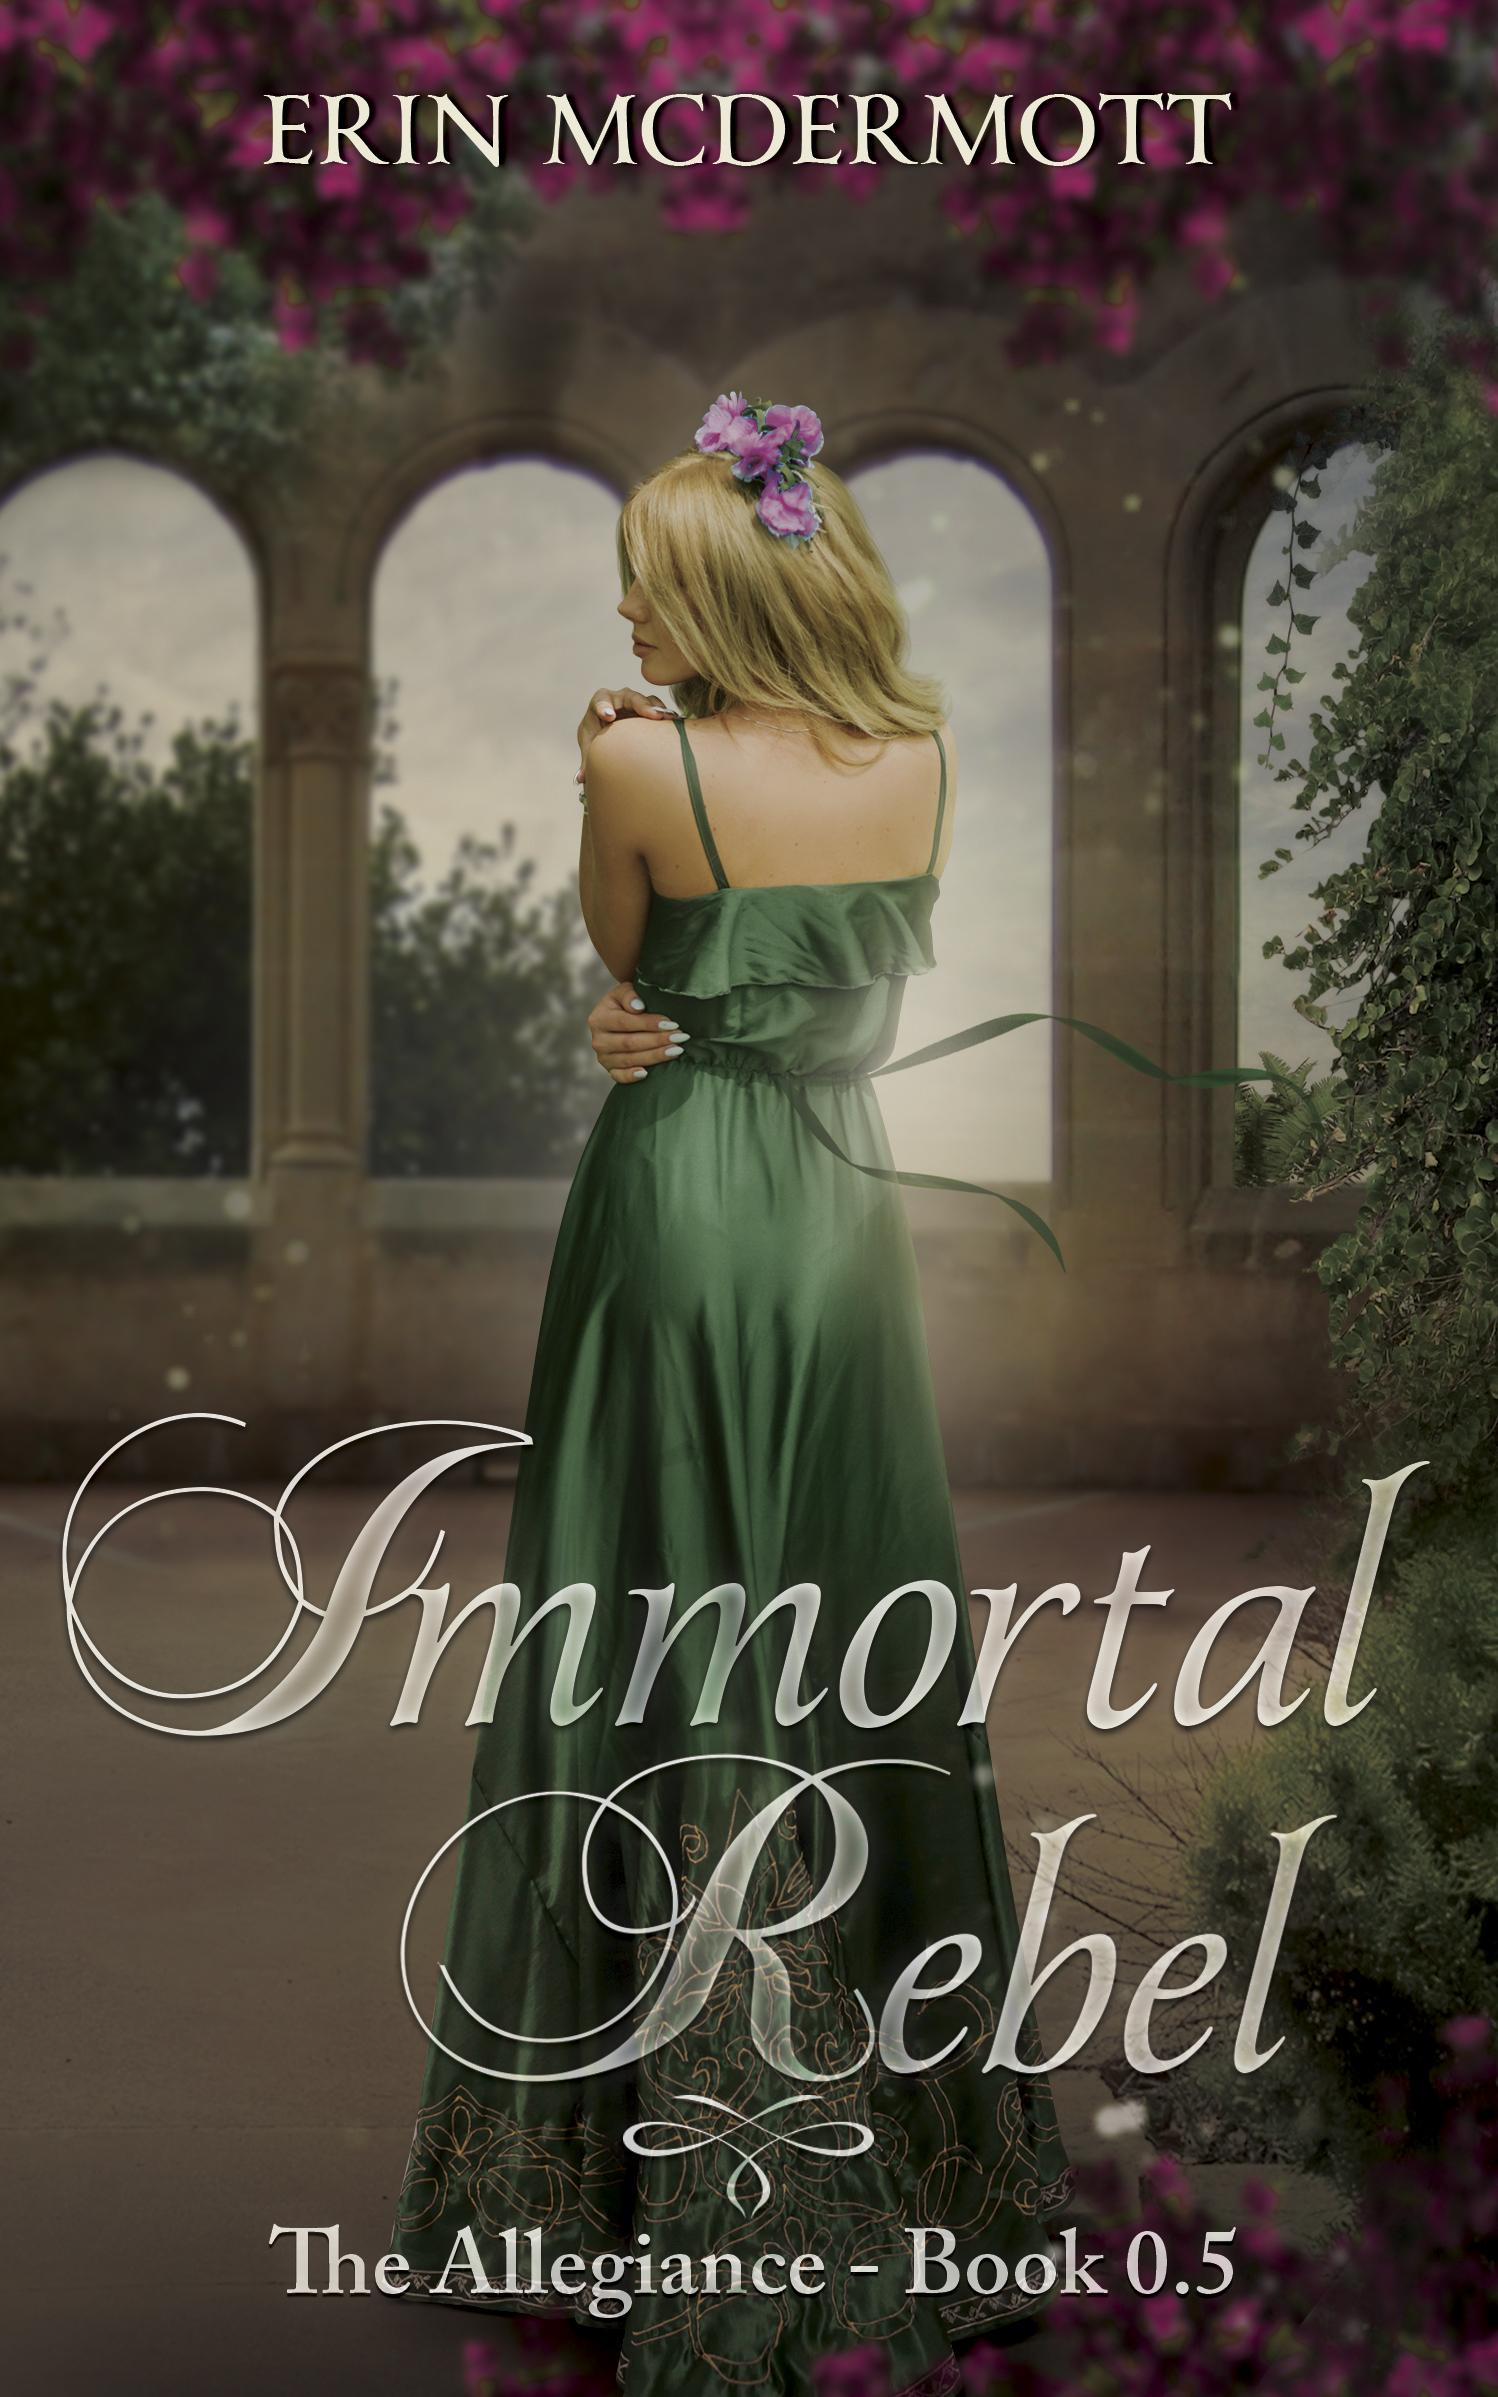 Immortal Rebel_Book cover_Kindle 01 (2).jpg